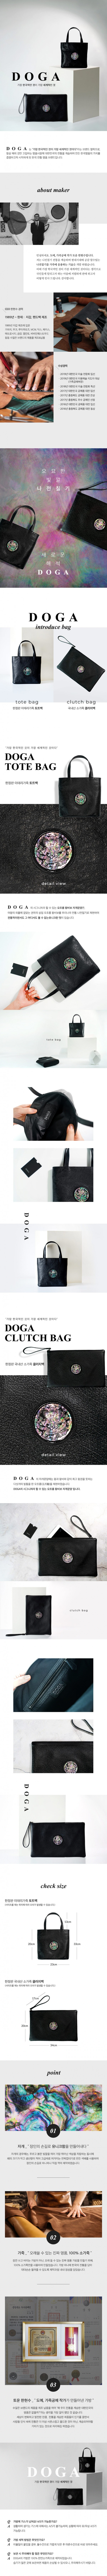 [D036]천연가죽 클러치백 상세페이지 + 촬영